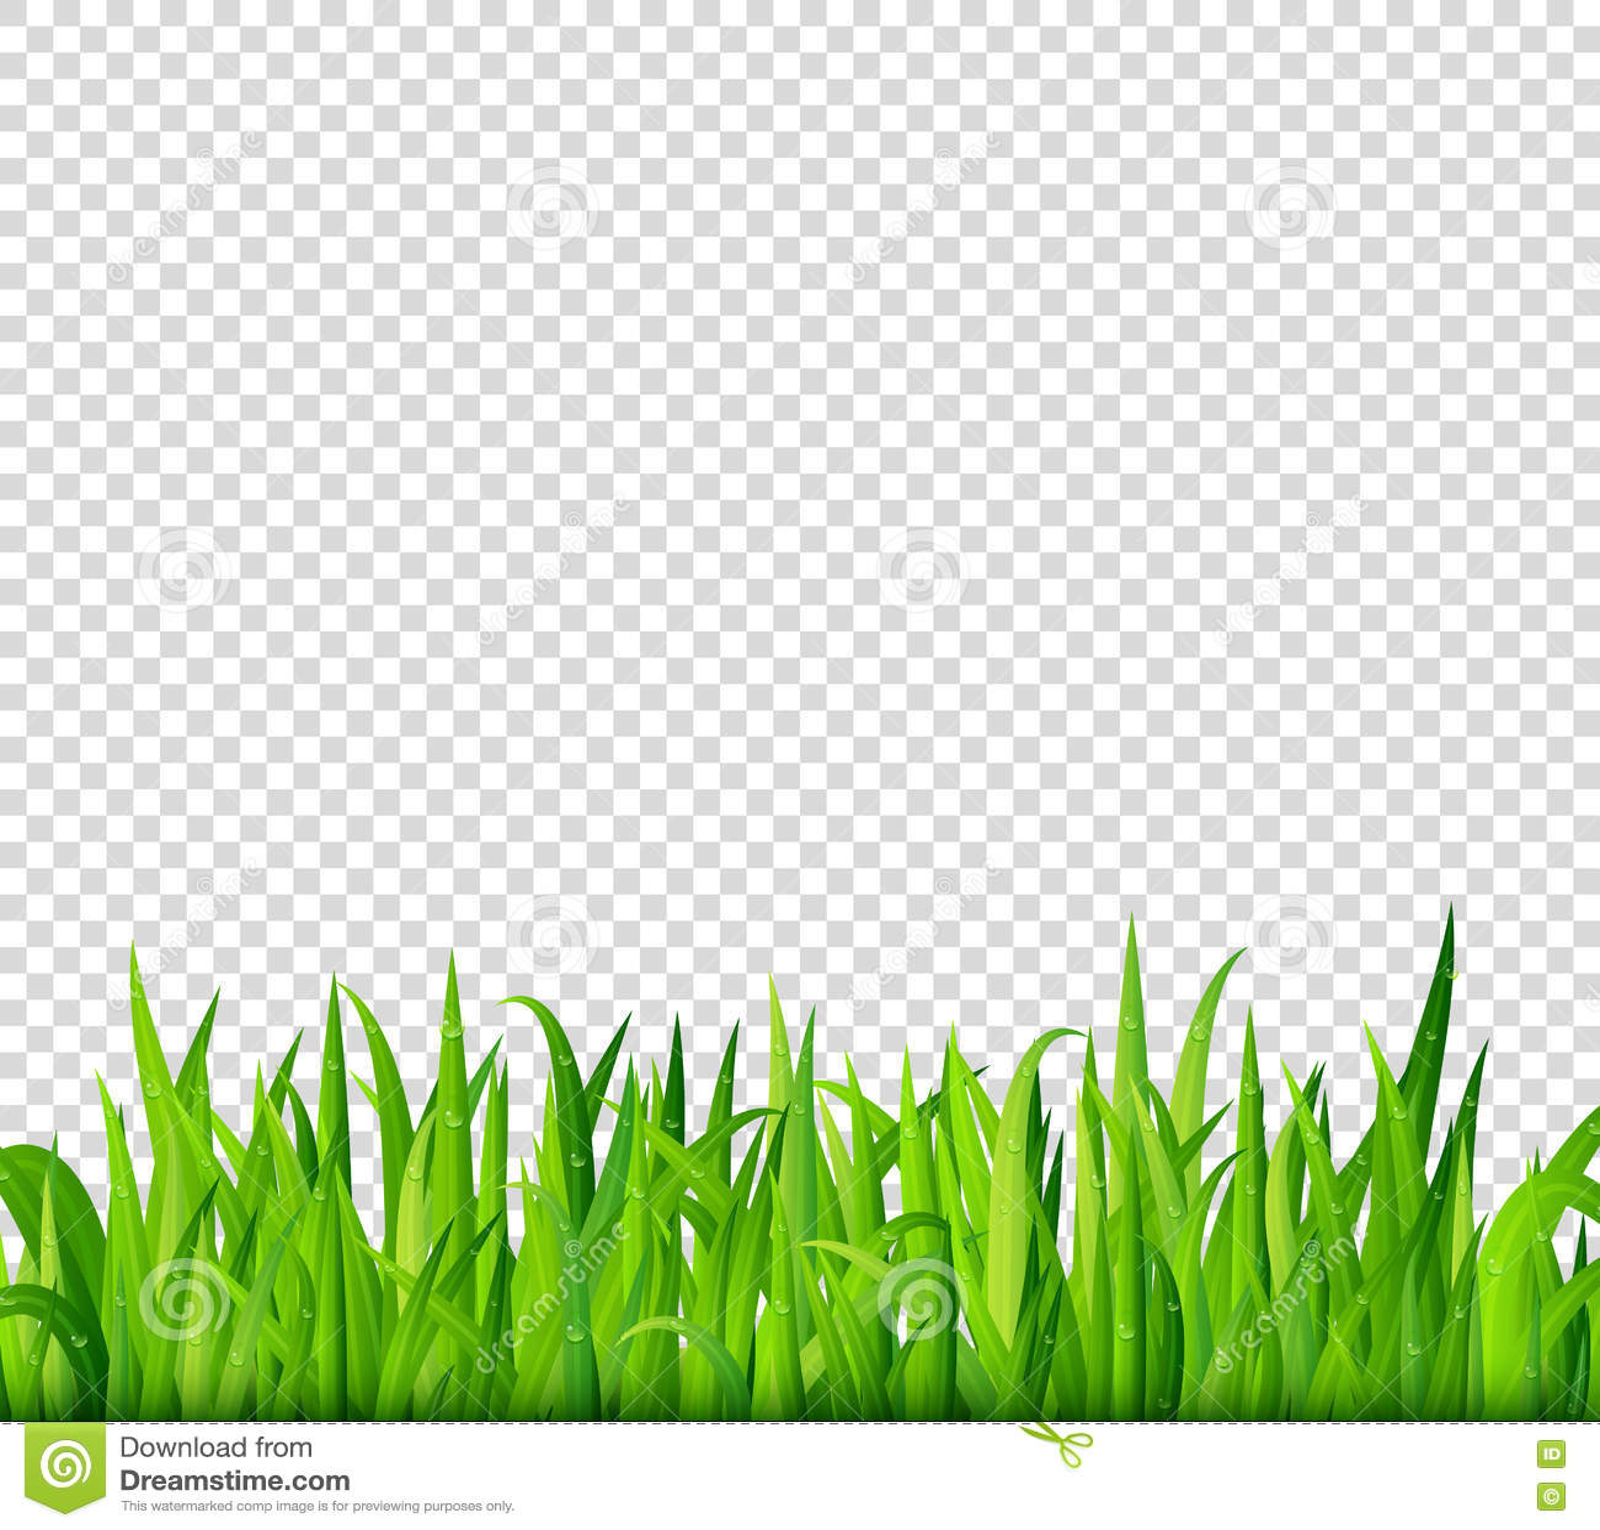 grass transparent background. Download Comp Grass Transparent Background M